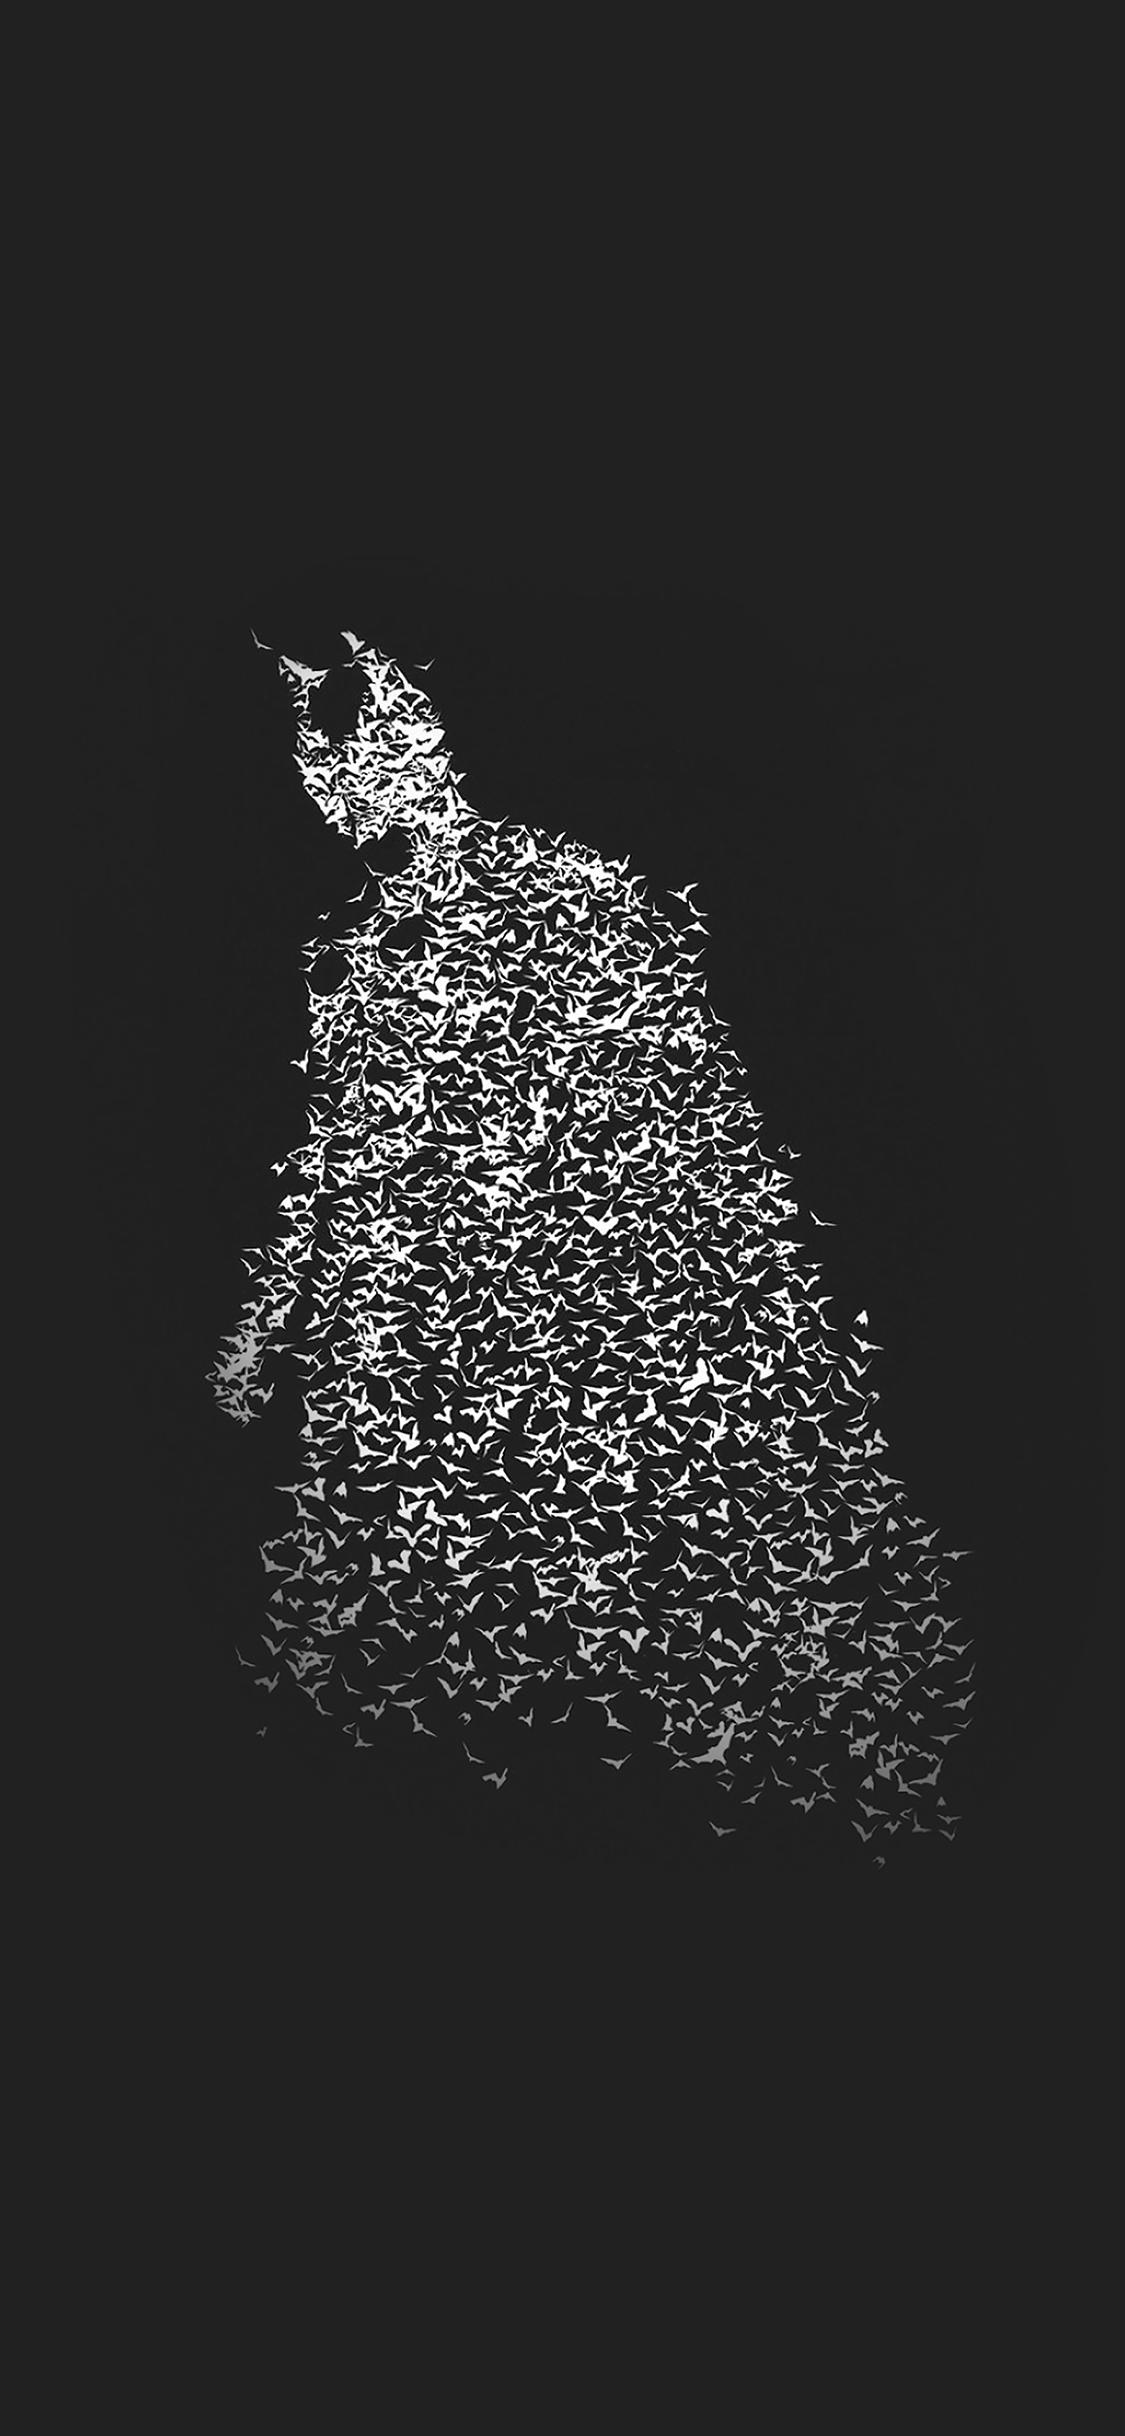 iPhoneXpapers.com-Apple-iPhone-wallpaper-ab86-wallpaper-batman-by-bats-pattern-darknight